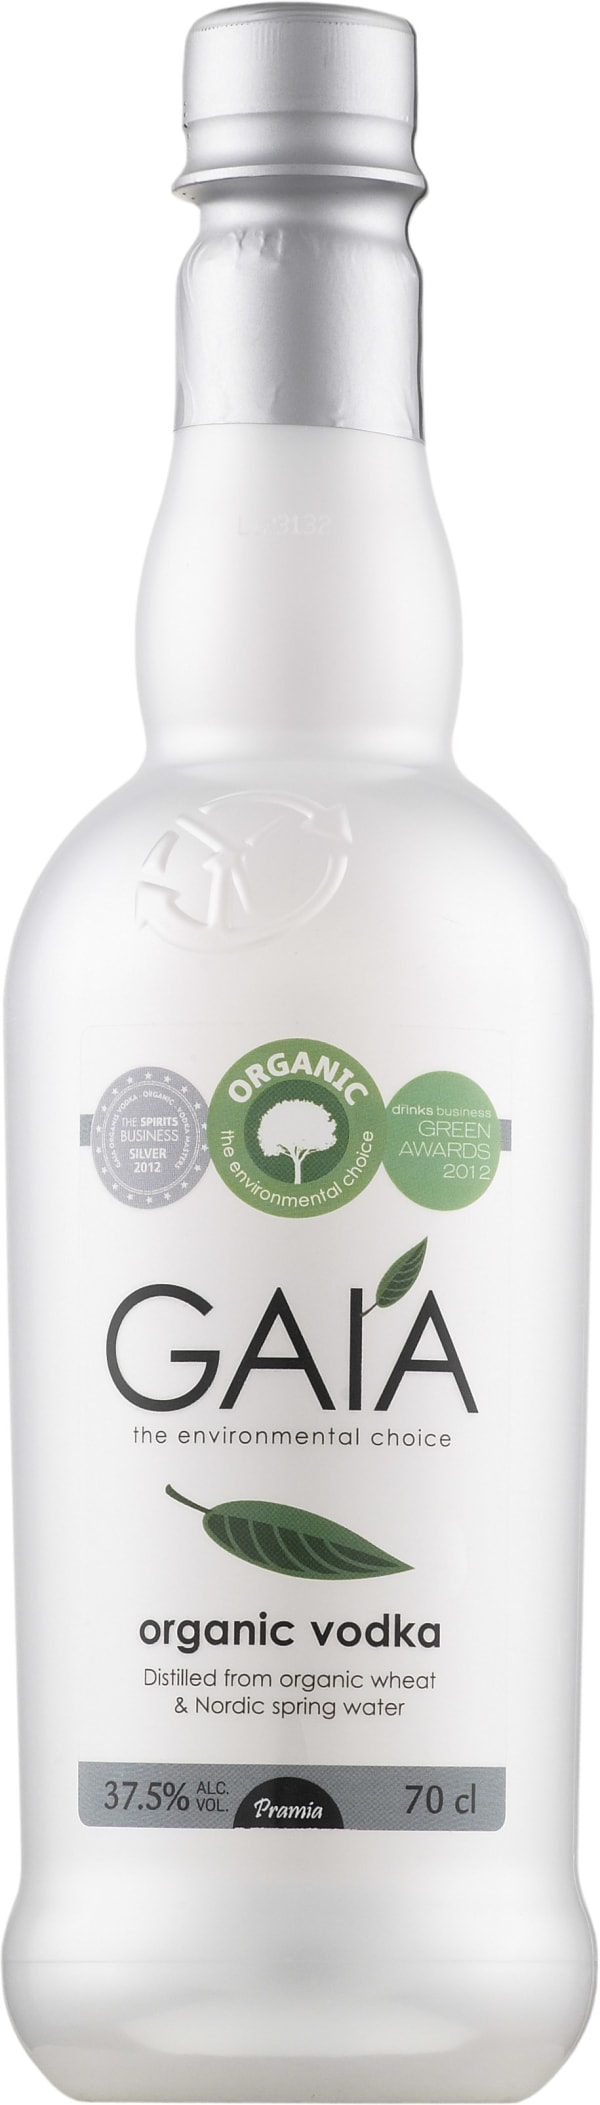 Gaía Organic Vodka  plastflaska